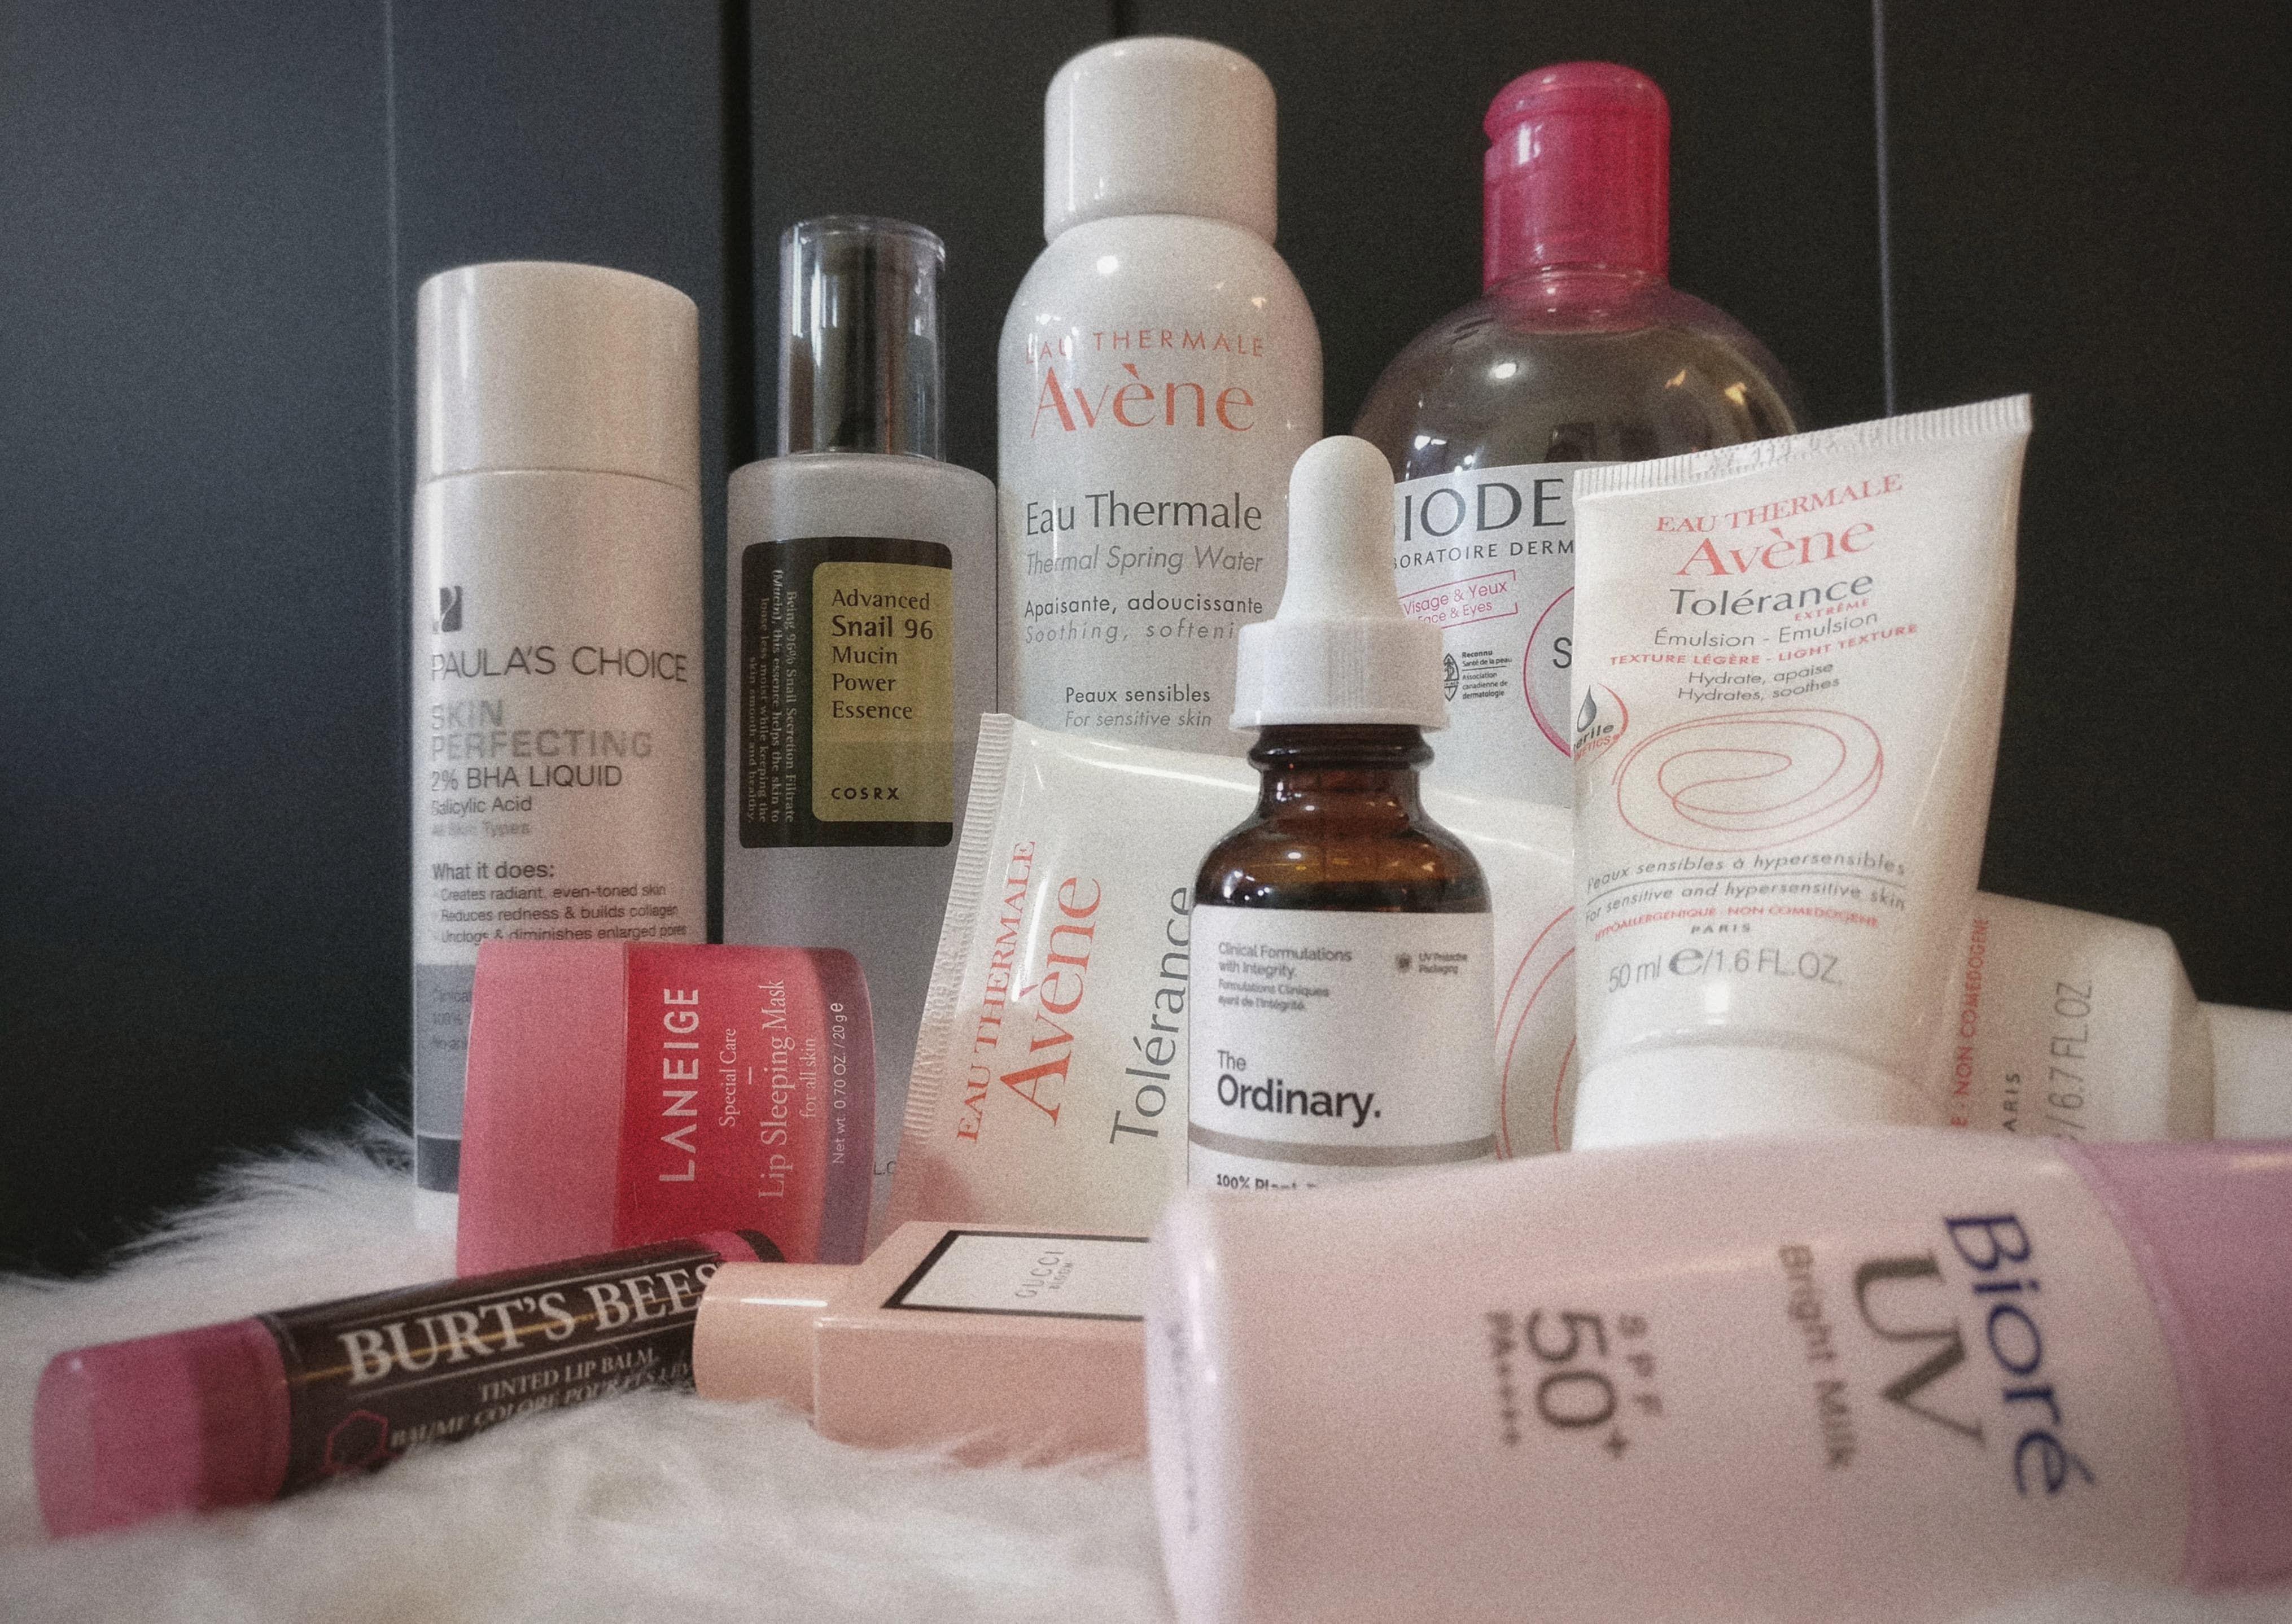 Shelfie Review Fungal Acne Safe Products Acne Help Shelfie Skin Care Acne